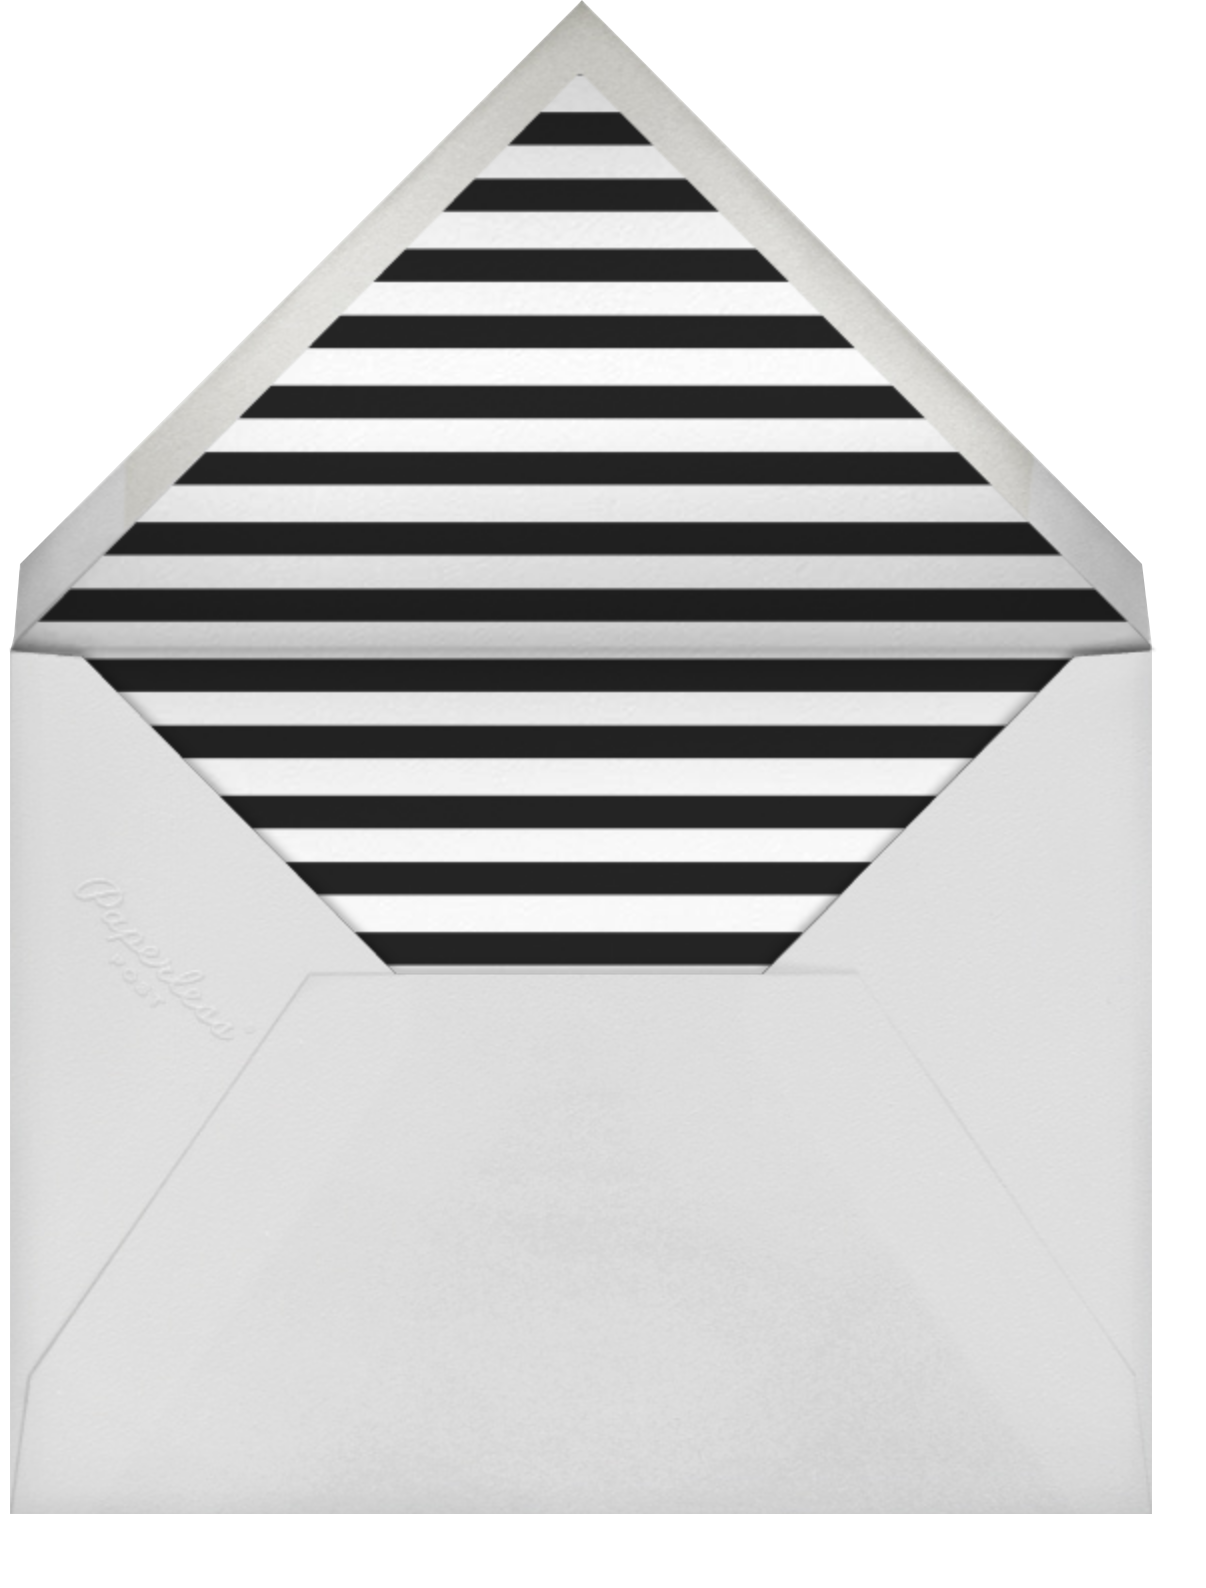 Confetti Bulbs - kate spade new york - Christmas party - envelope back